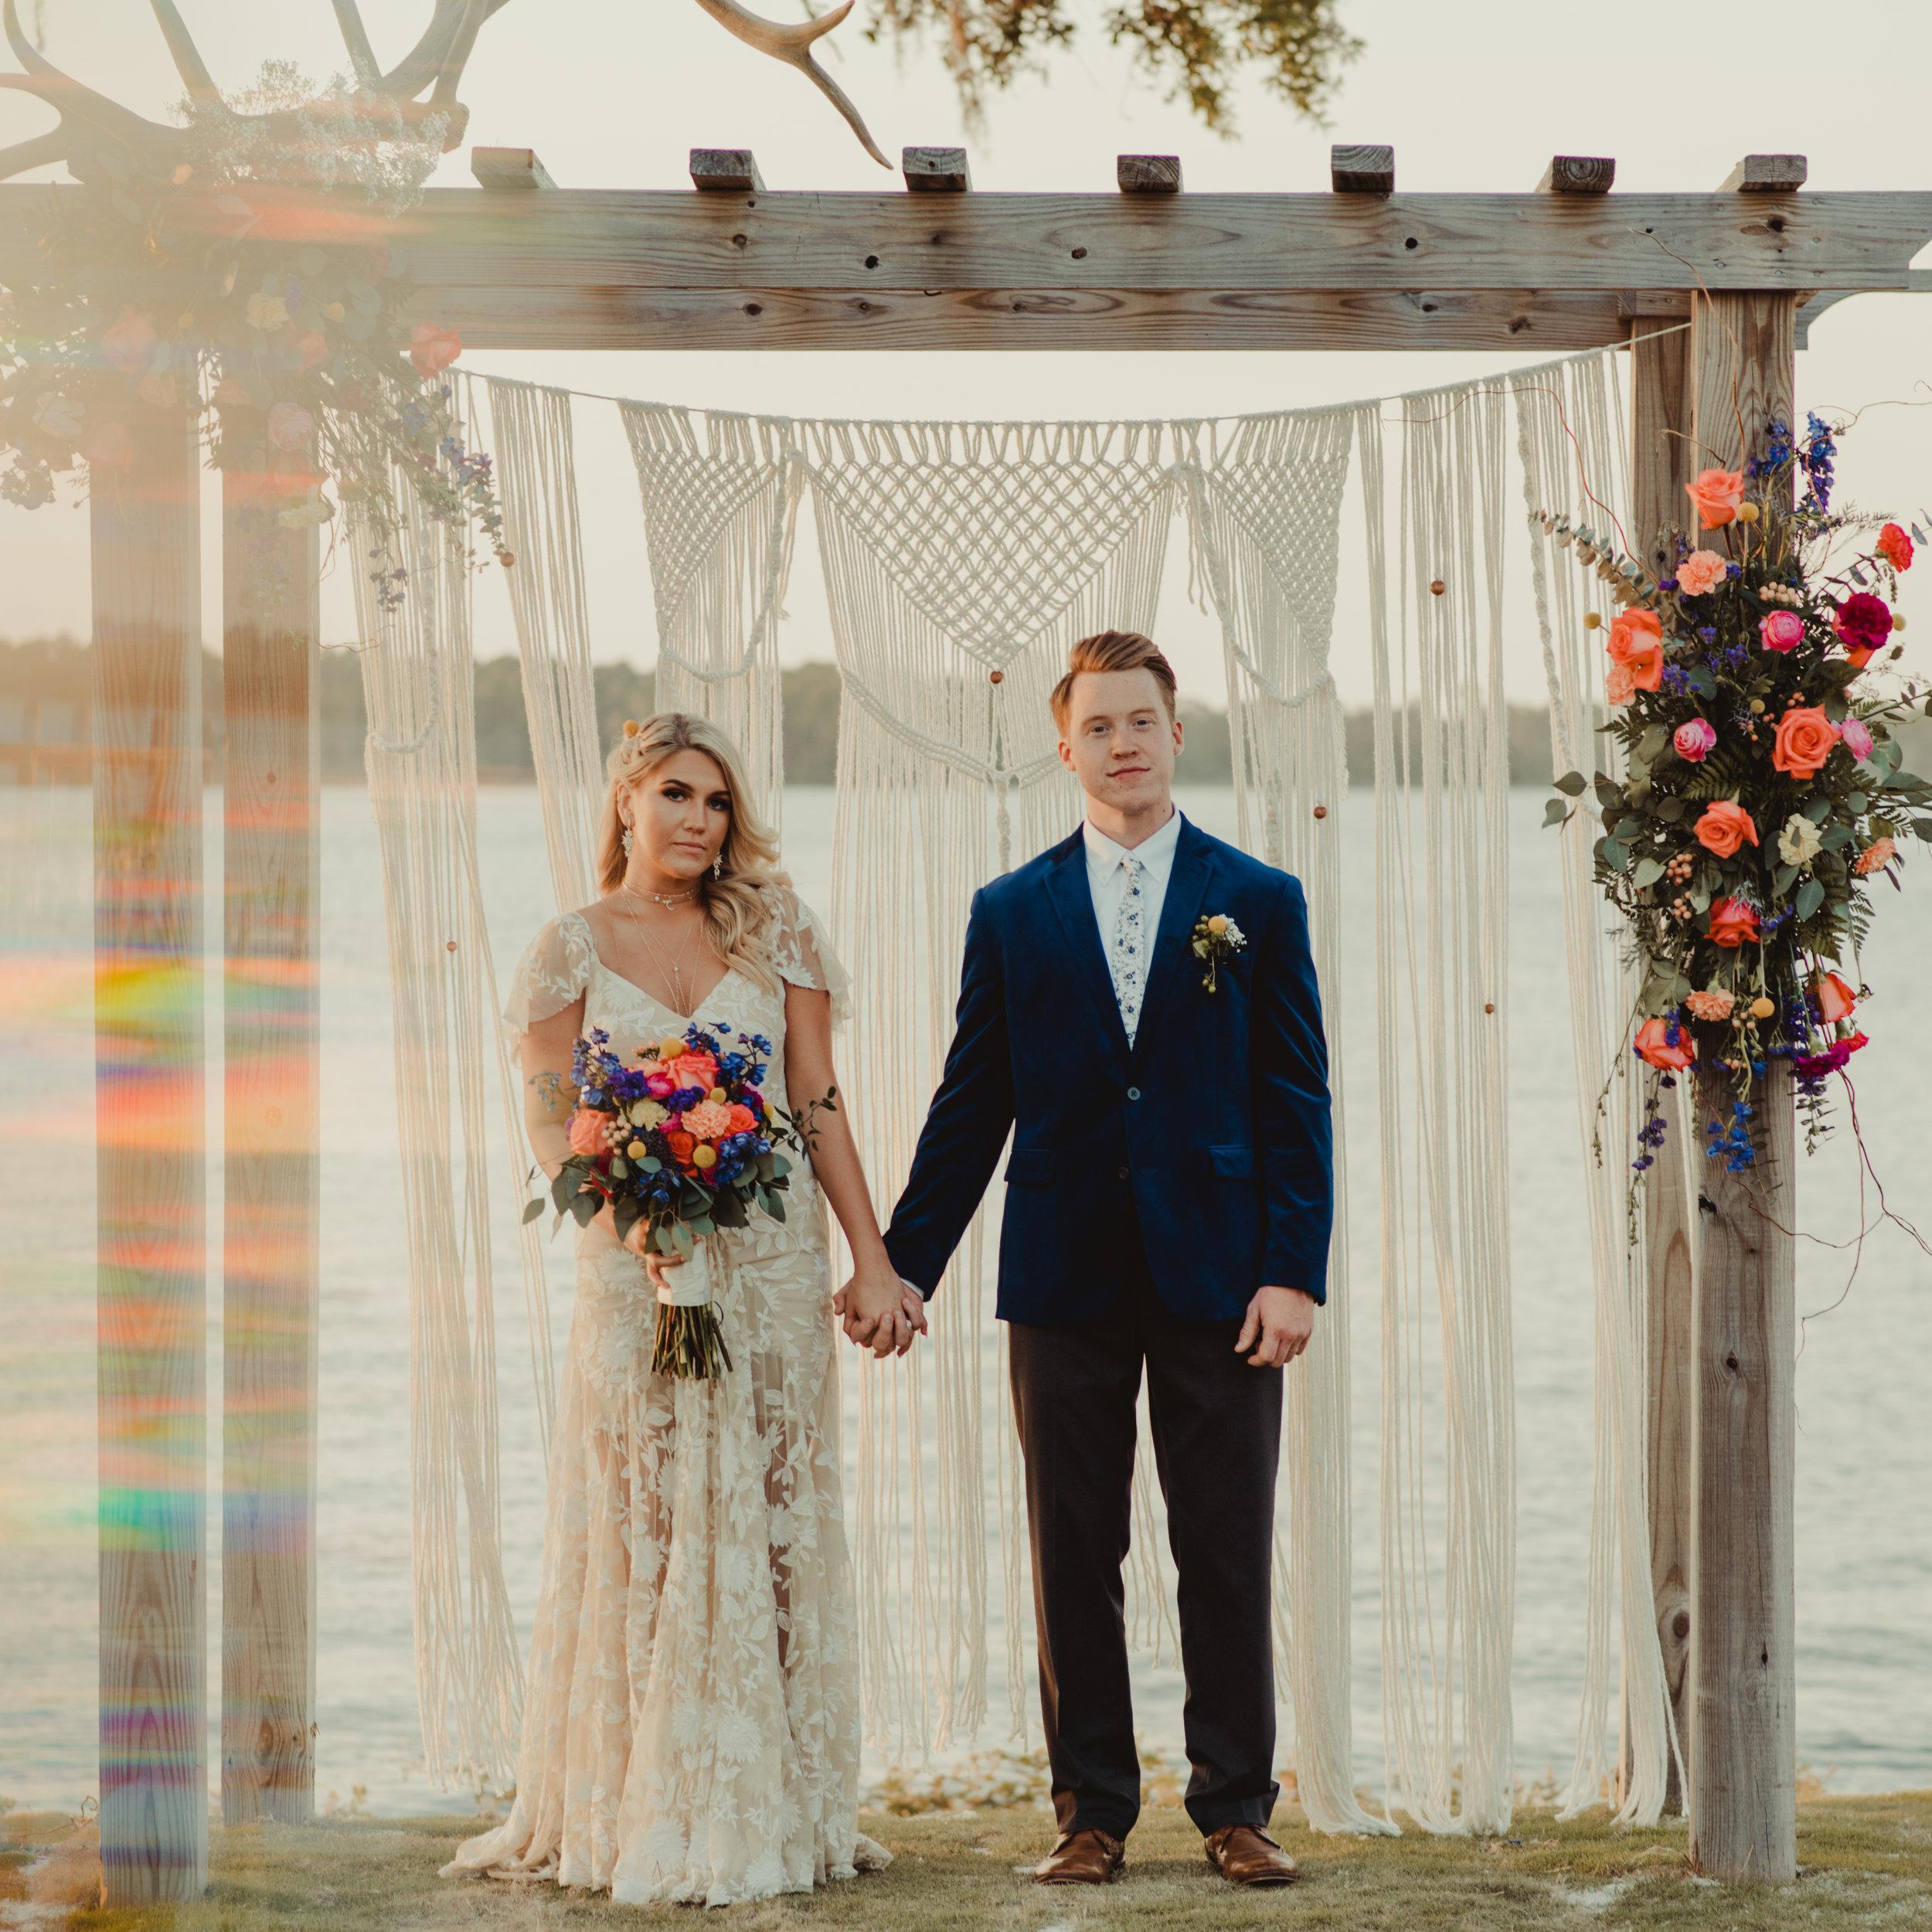 zayda-collin-panama-city-wedding-photography-trippy-bohemian-lisa-frank-wedding-couple-portraits.jpg